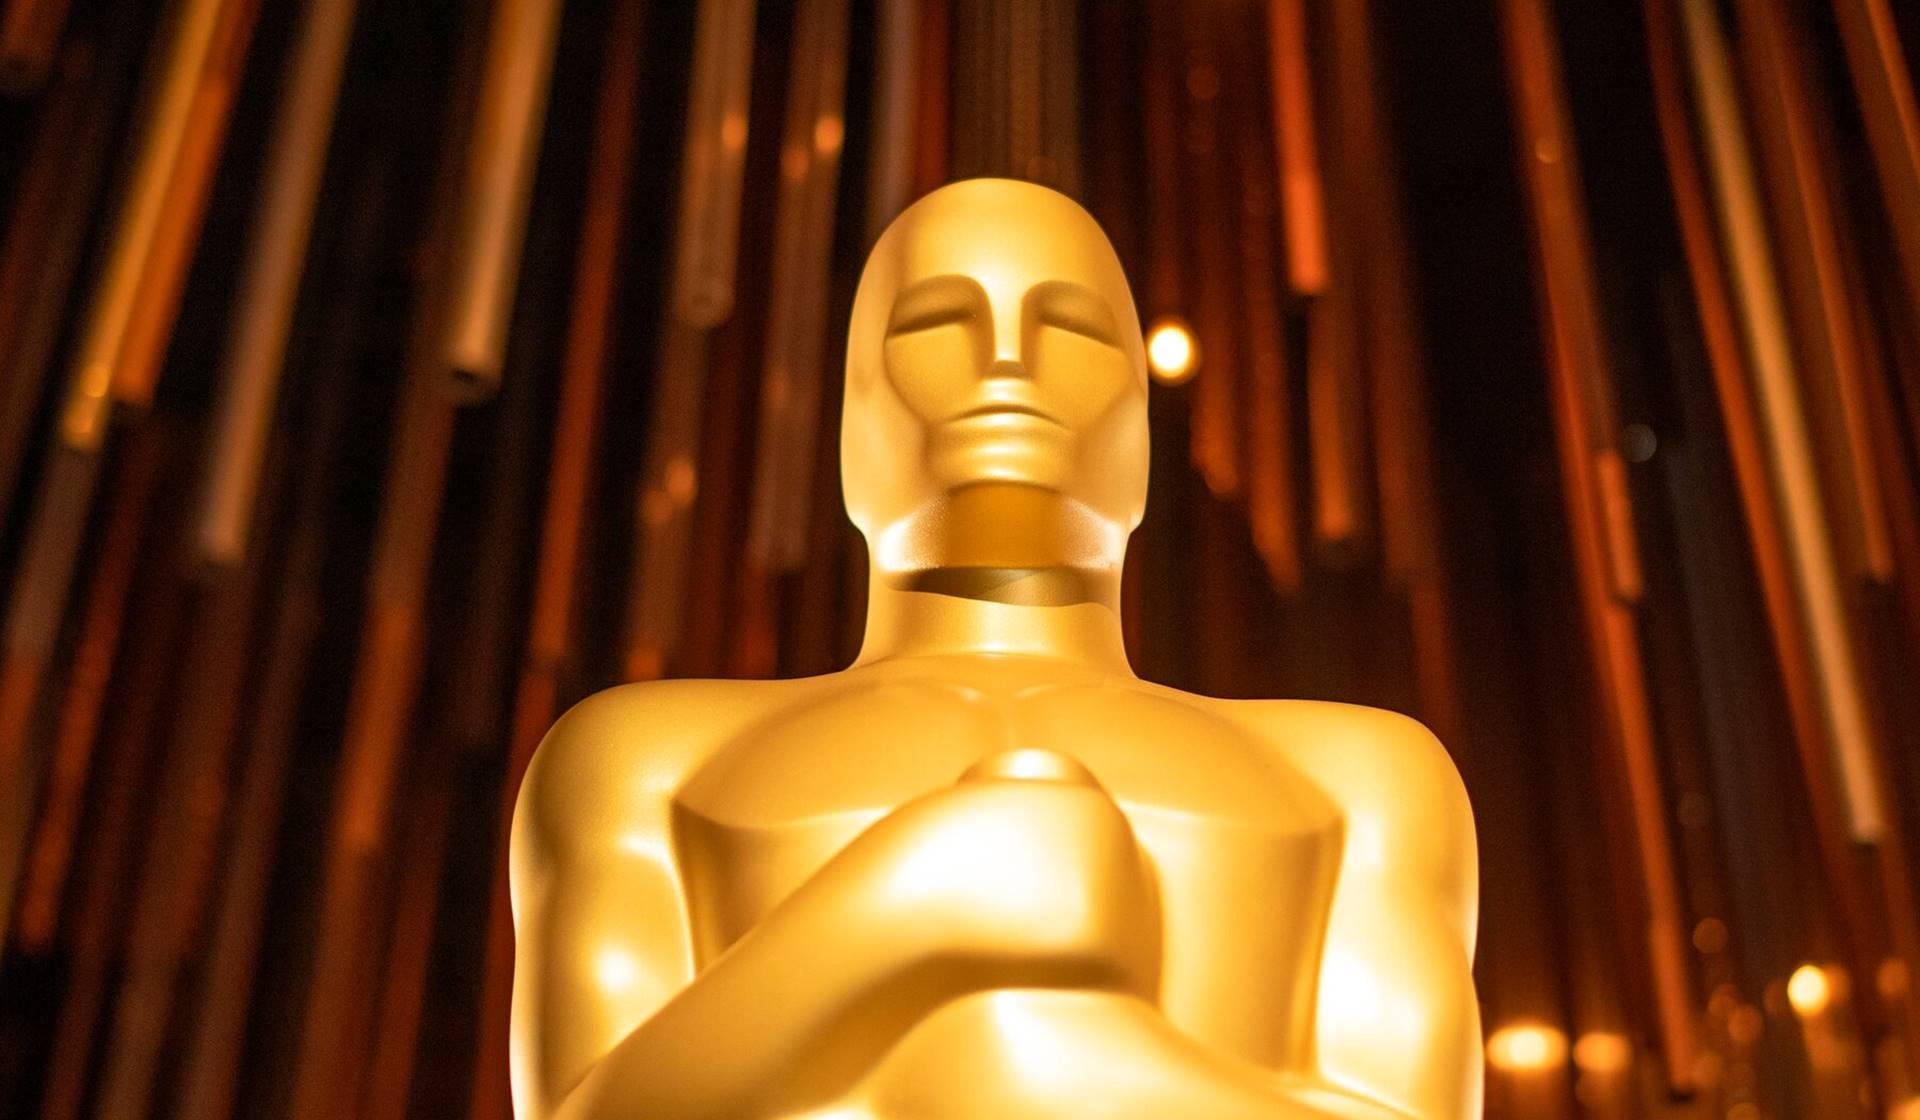 Premios Oscar año 2021.